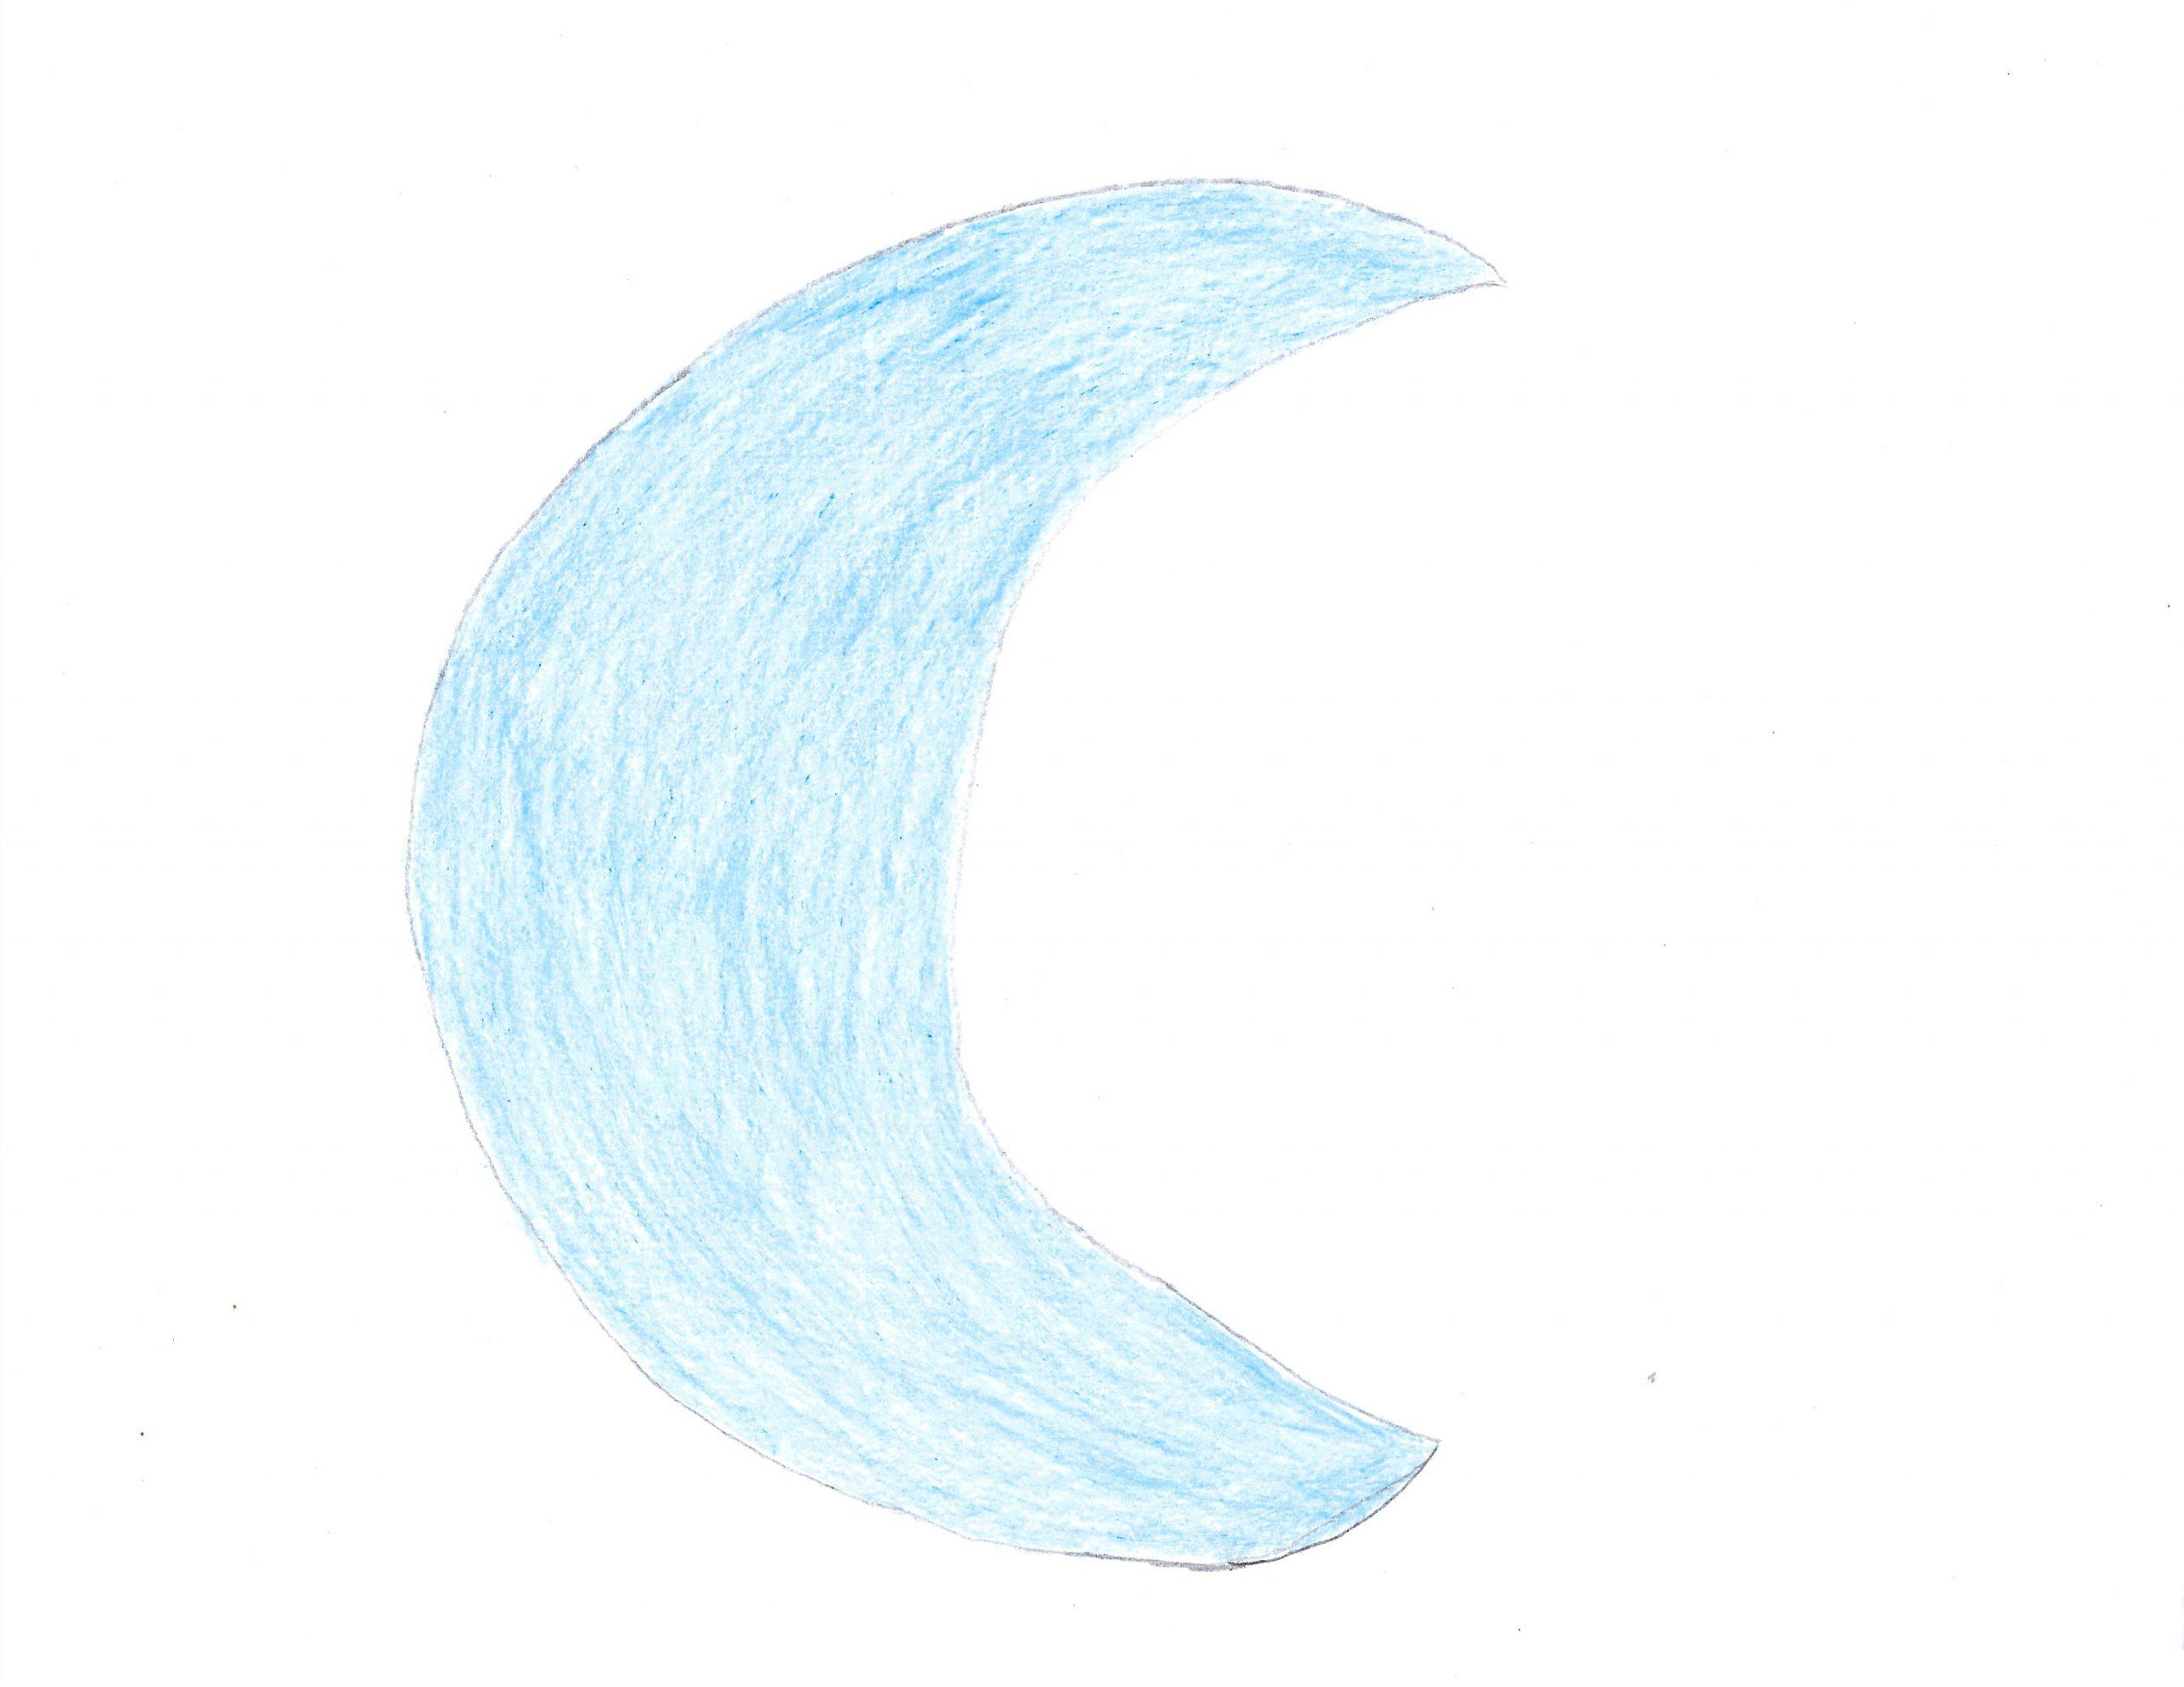 Jasy ― The moon